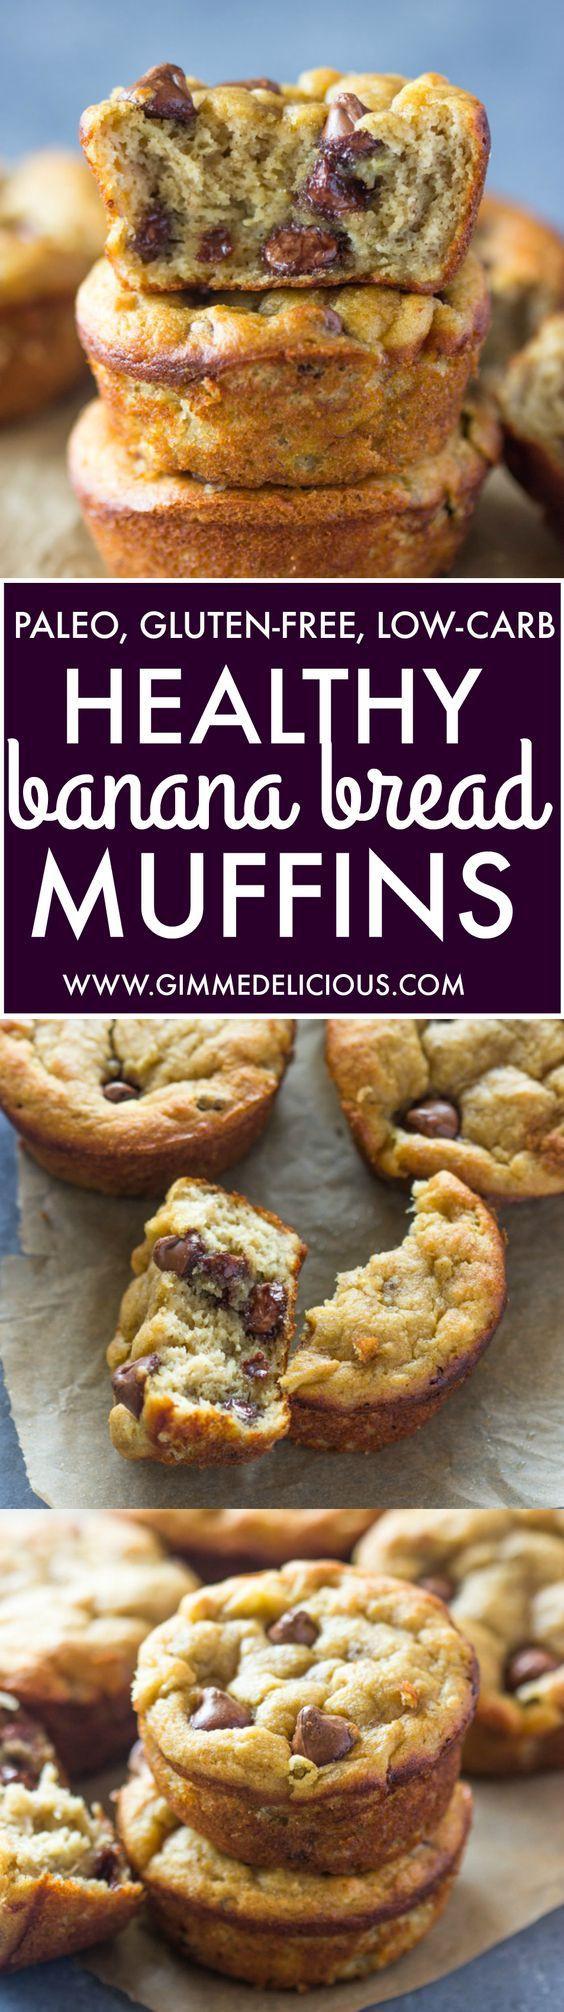 Banana Bread Muffins Healthy  Healthy Banana Bread Muffins Paleo Gluten Free